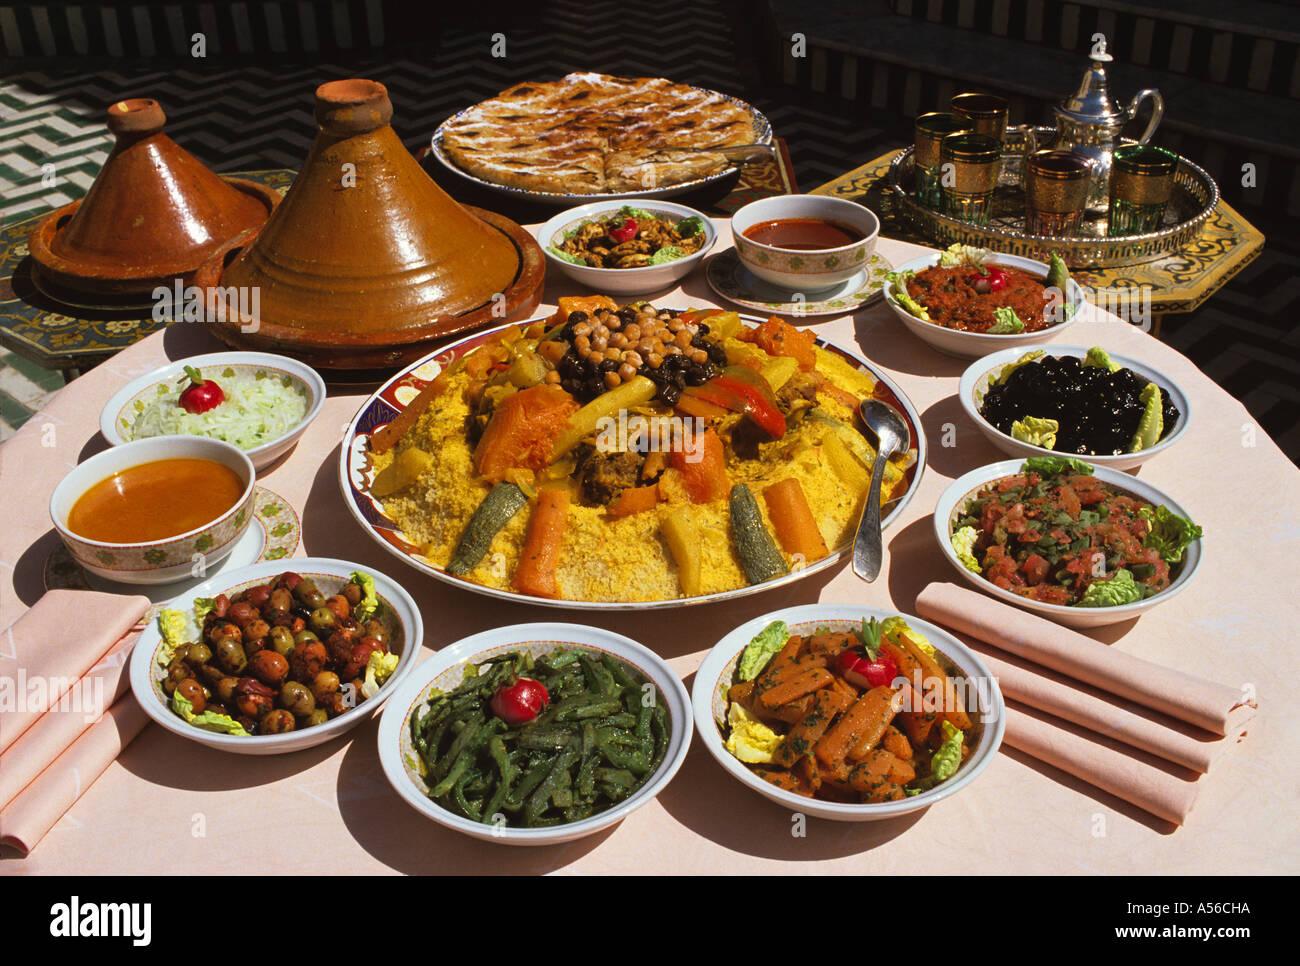 Moroccan Food Restaurant Menu